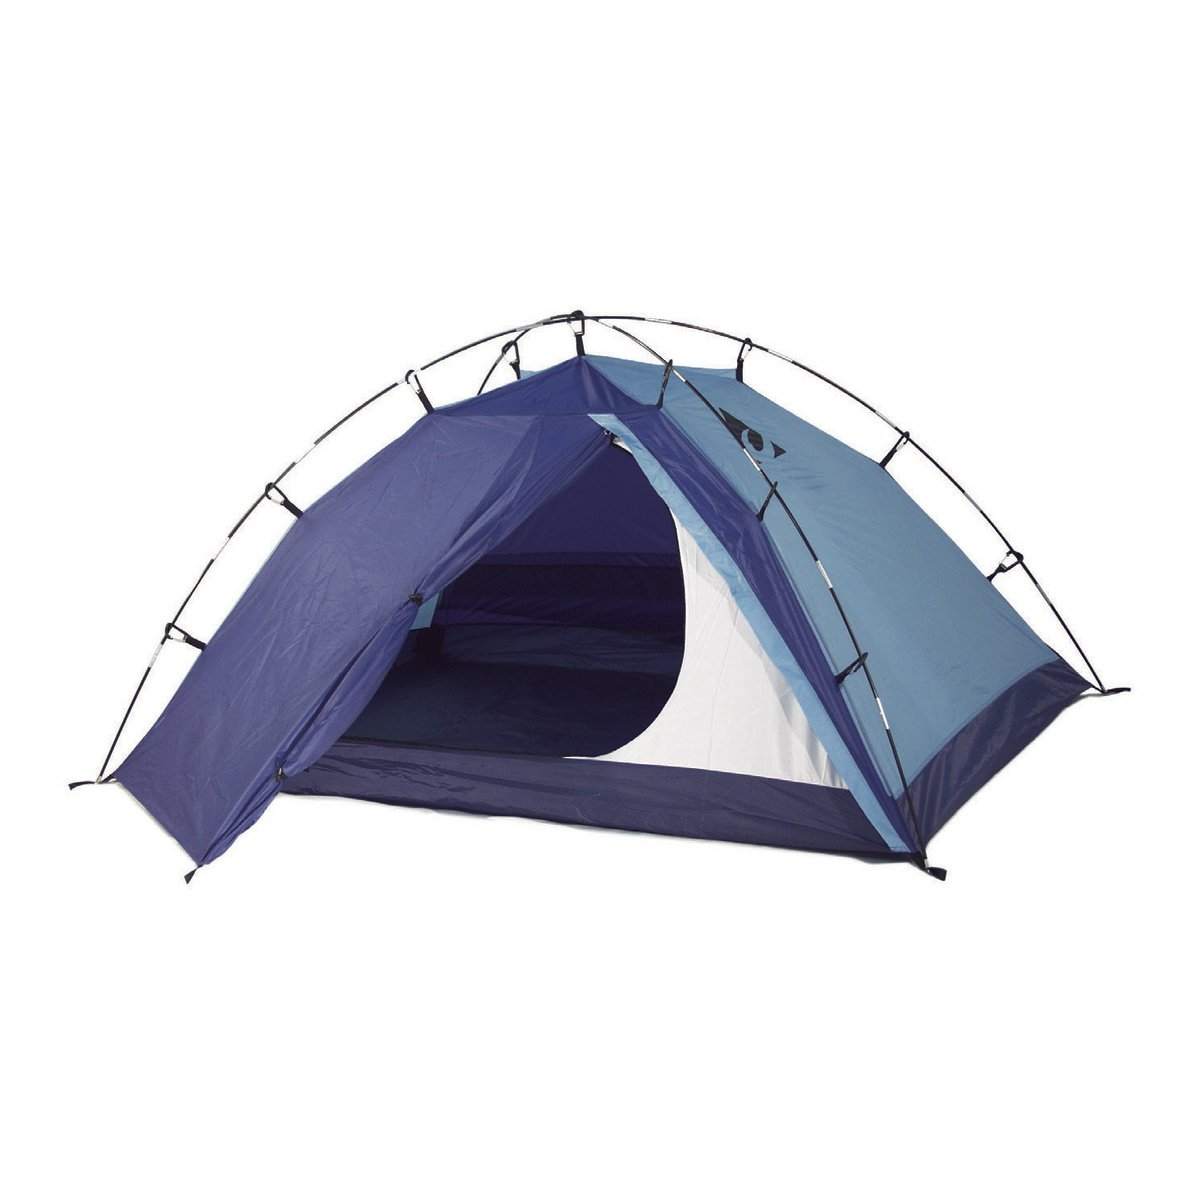 Chinook Sirocco 2-Person Aluminum Pole Tent